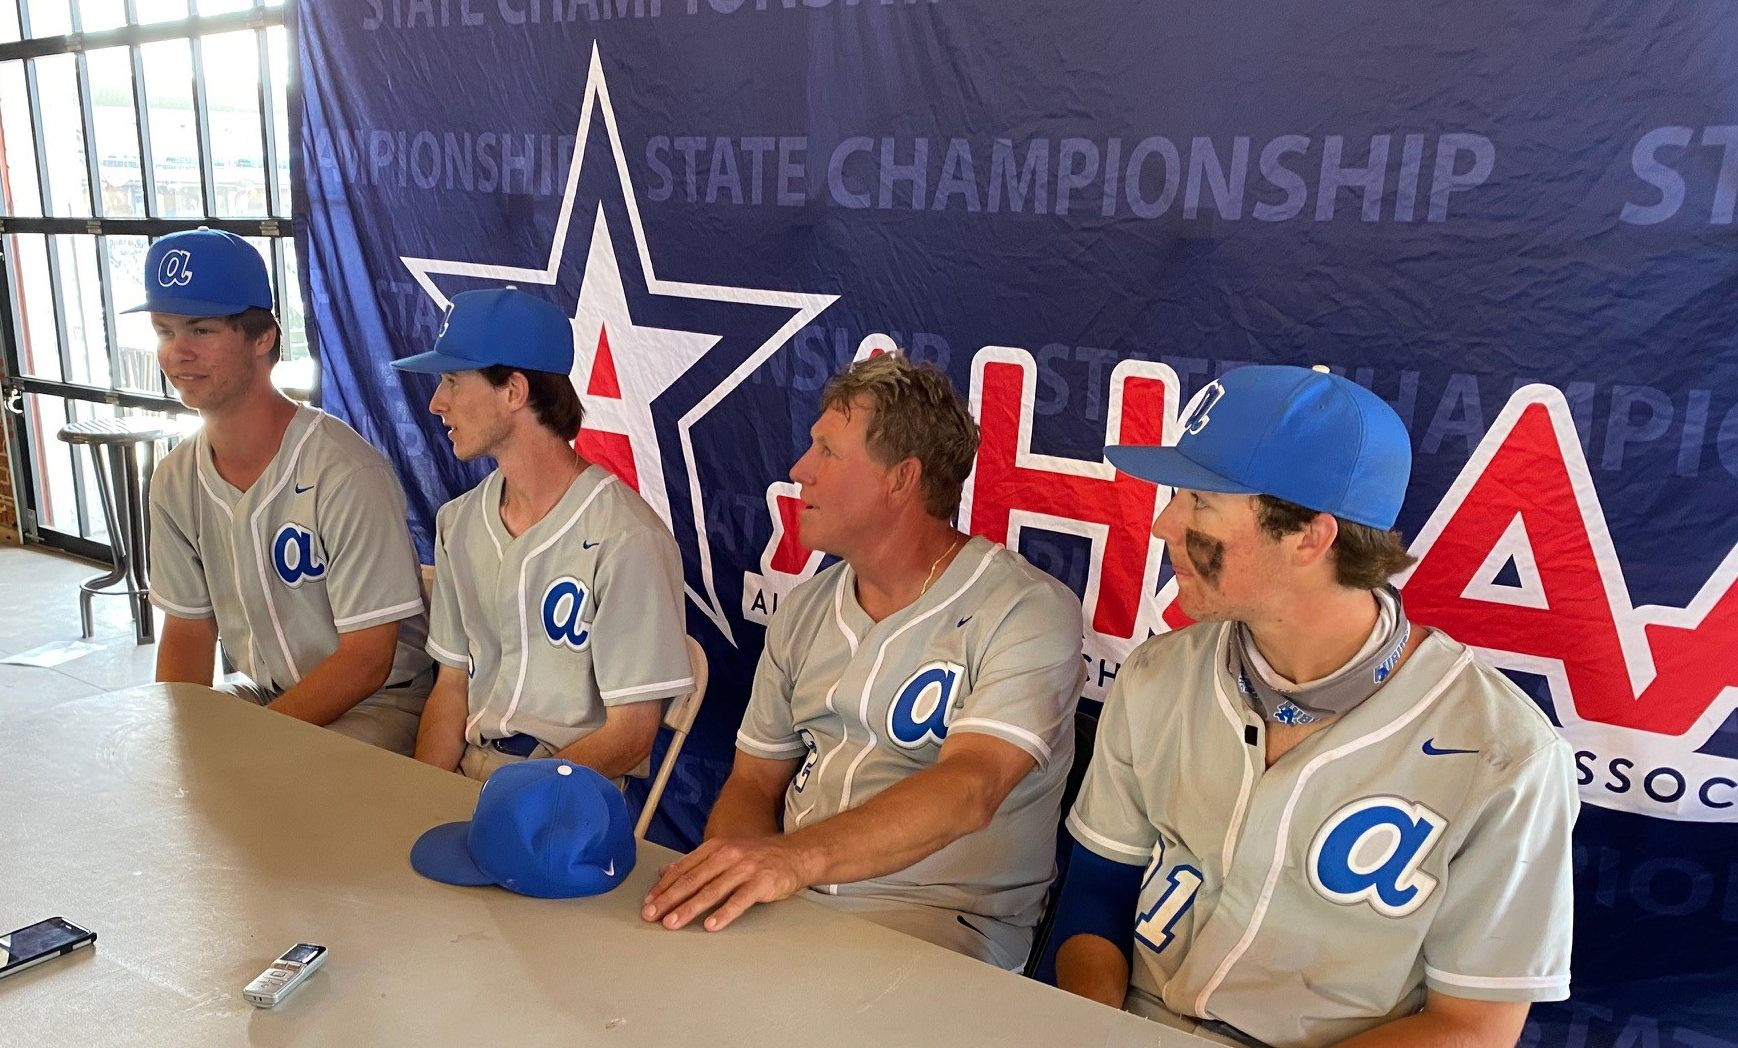 AHSAA STATE BASEBALL CHAMPIONSHIPS CLASS 7A Championships: Auburn 9-2-7, Hoover 2-8-6 (Auburn wins 7A title)